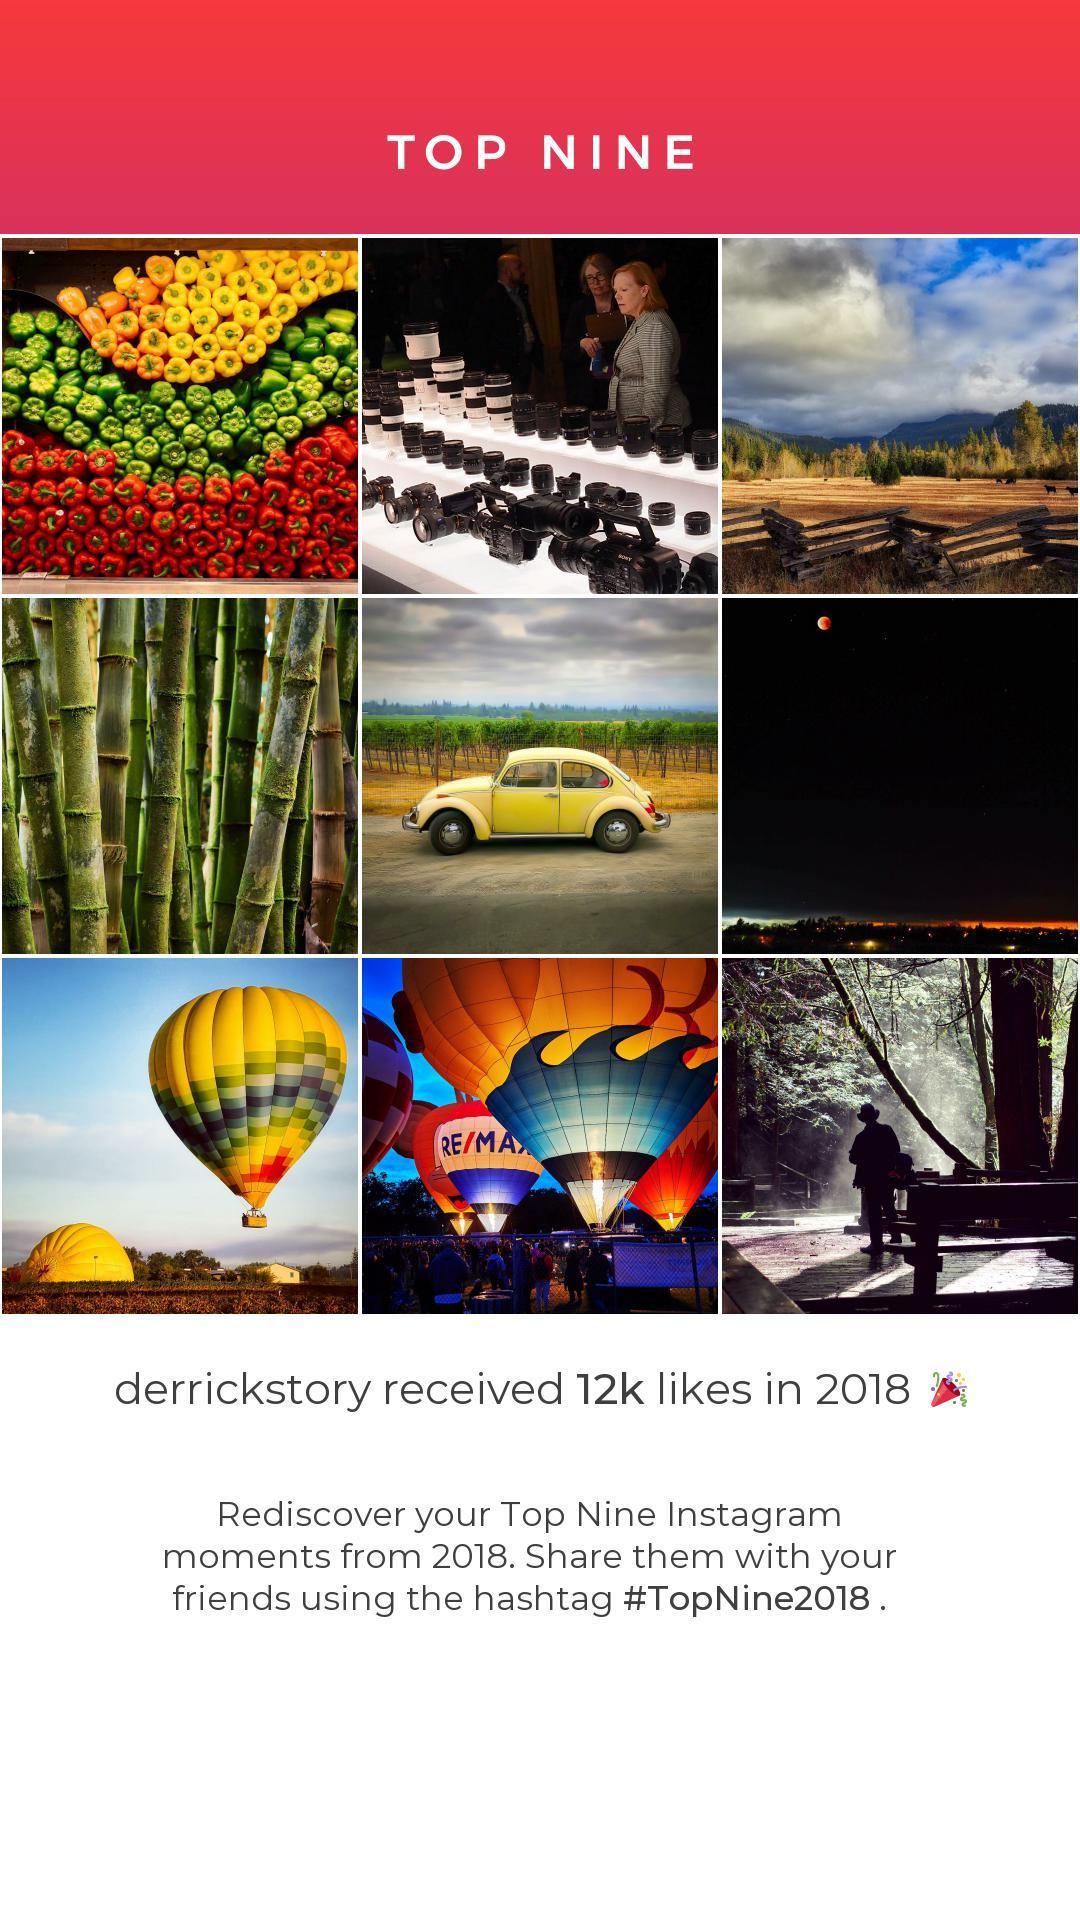 http://thedigitalstory.com/2018/12/21/derrick-story-top-9.jpg